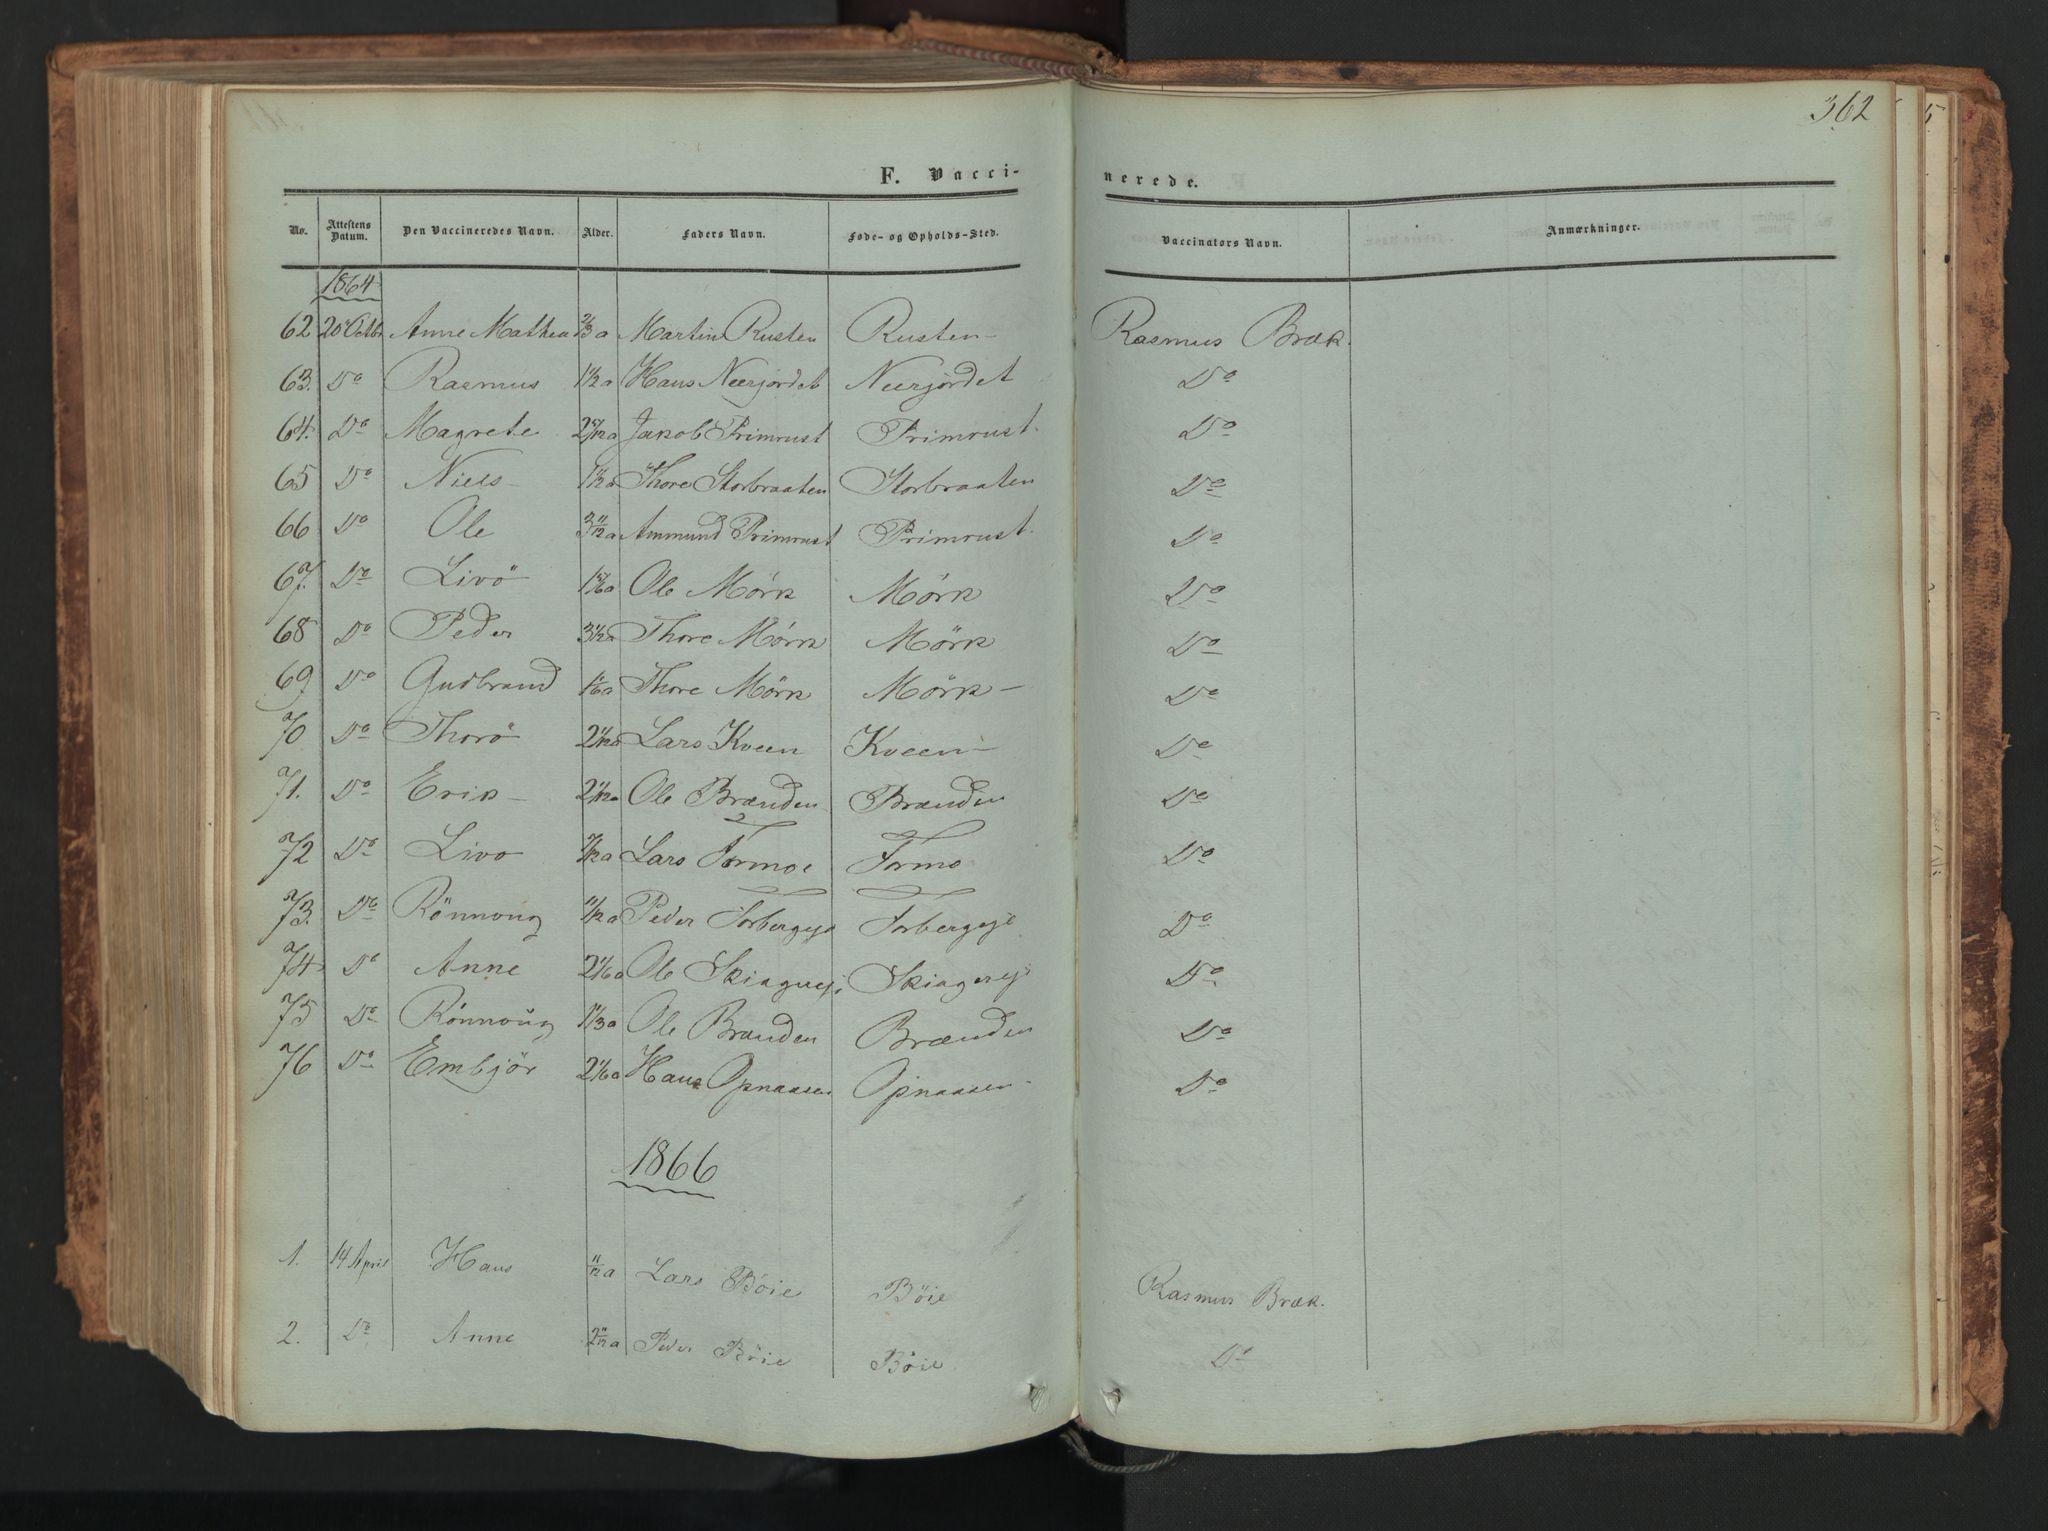 SAH, Skjåk prestekontor, Ministerialbok nr. 1, 1863-1879, s. 362